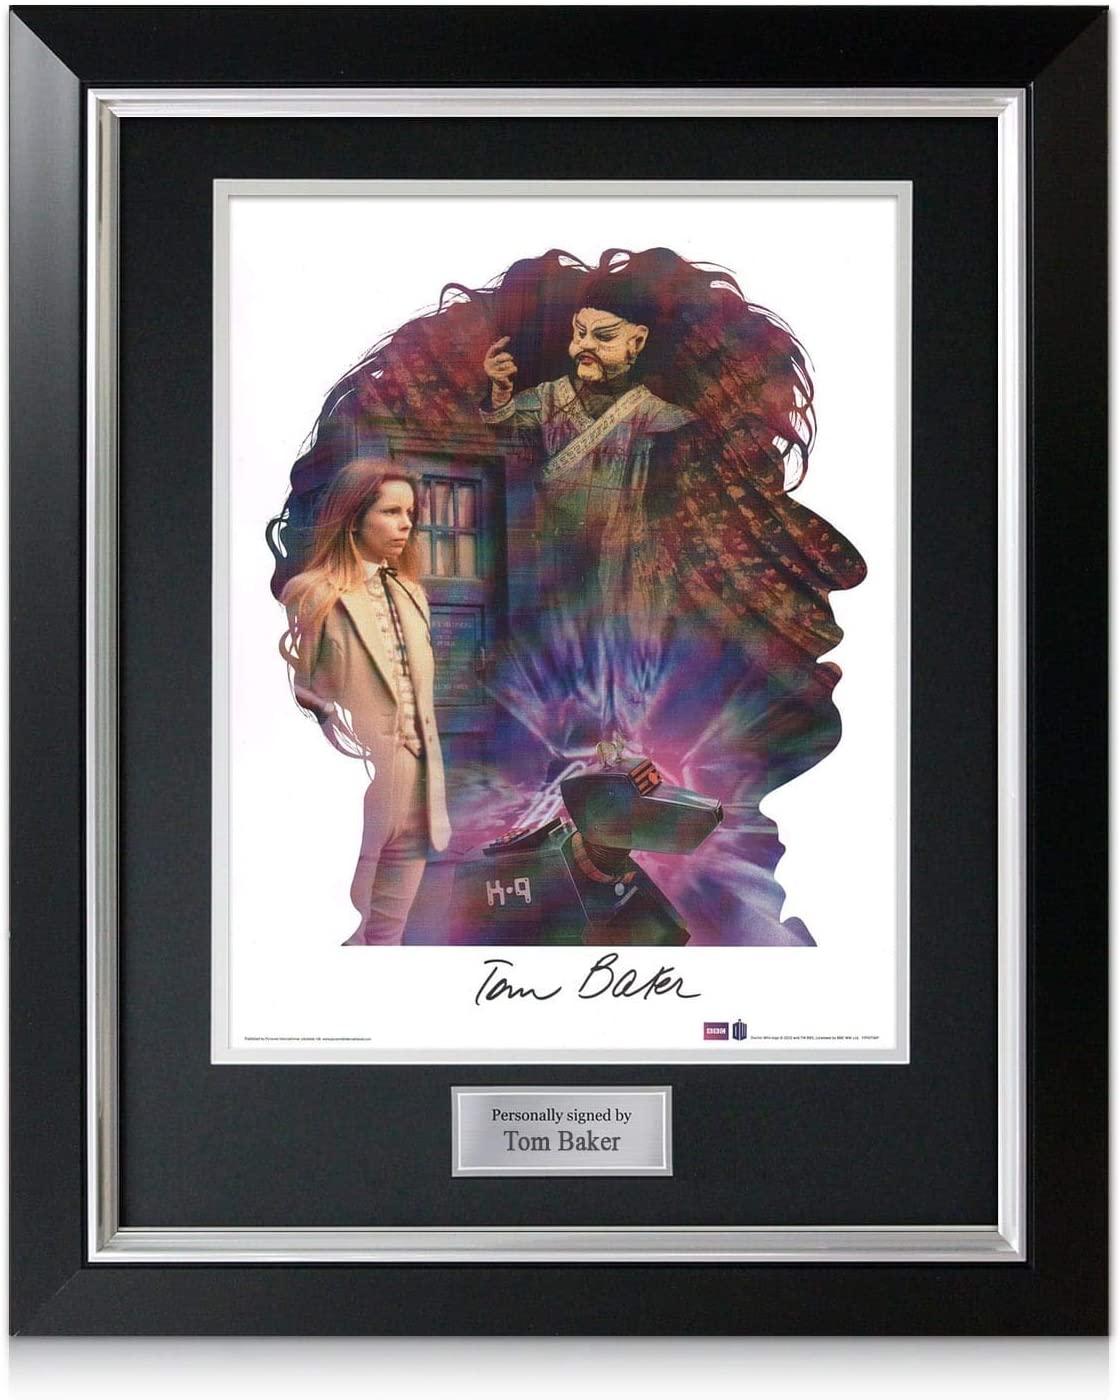 Dr Who Signed Tom Baker Poster Gift 2